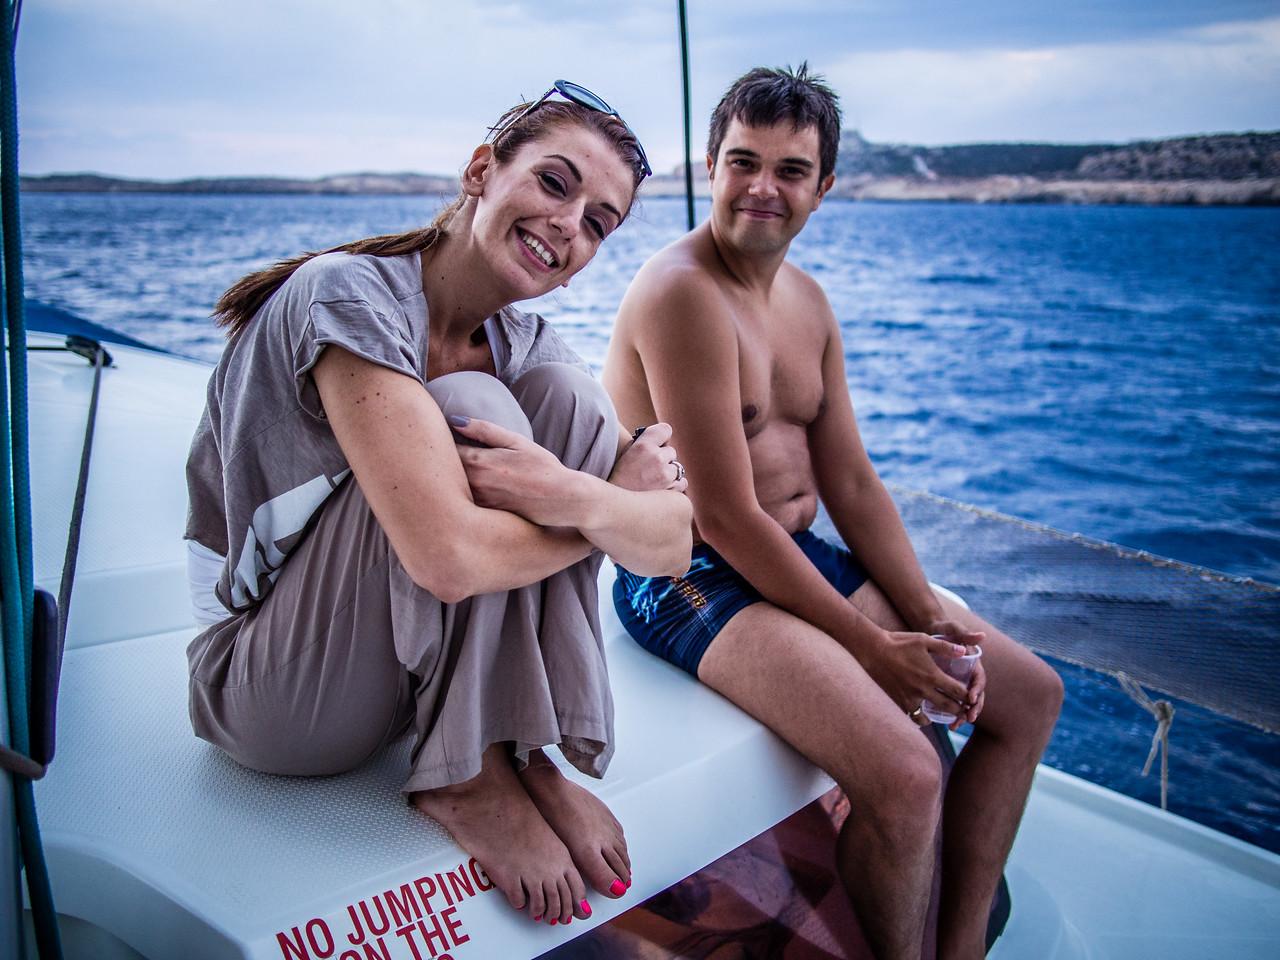 Tati and Aleksey in a boat